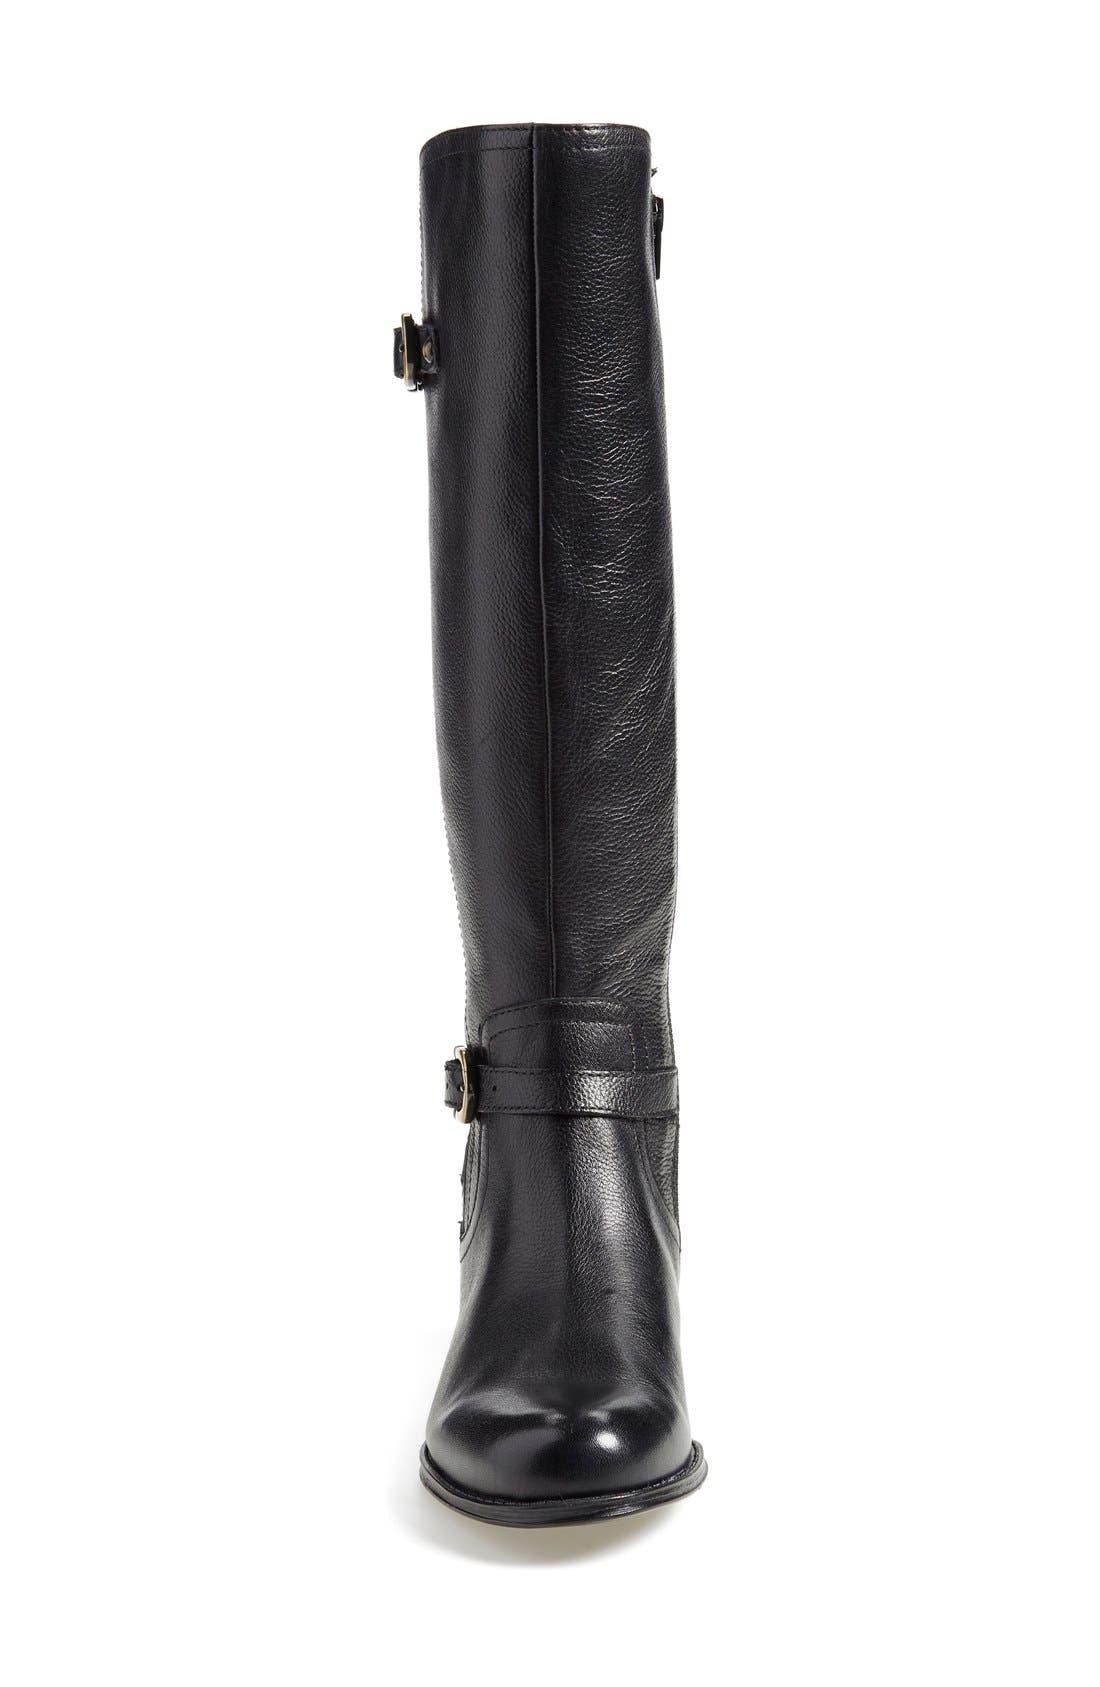 'Jennings' Knee High Boot,                             Alternate thumbnail 3, color,                             Black Leather